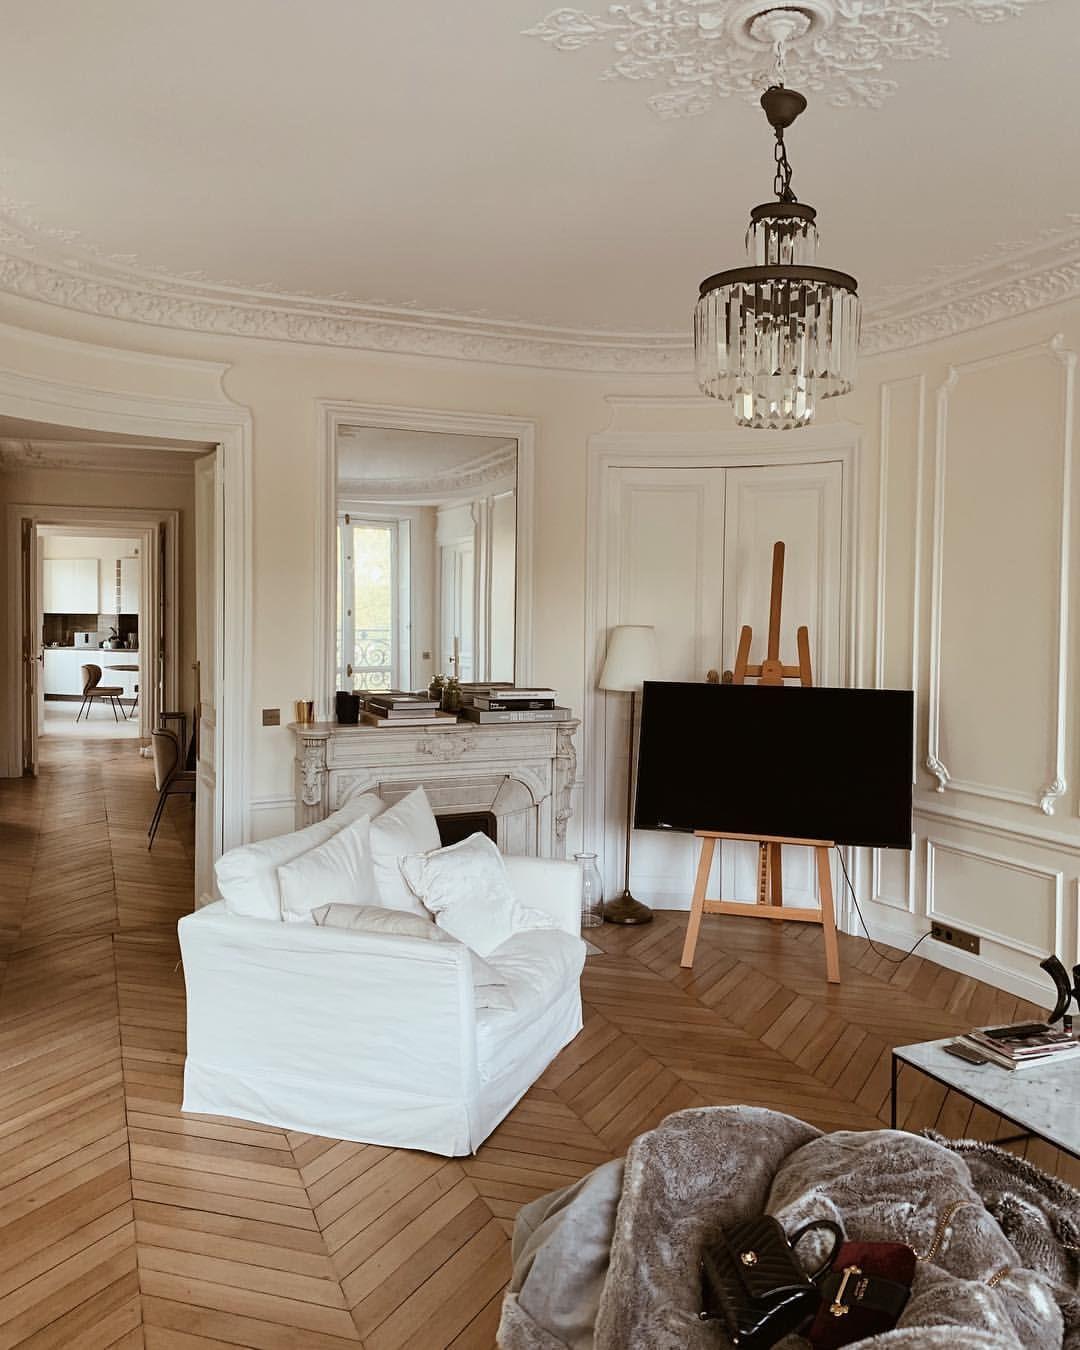 Xenia Adonts Sur Instagram Feels So Good To Be Home Maison Deco Petite Maison